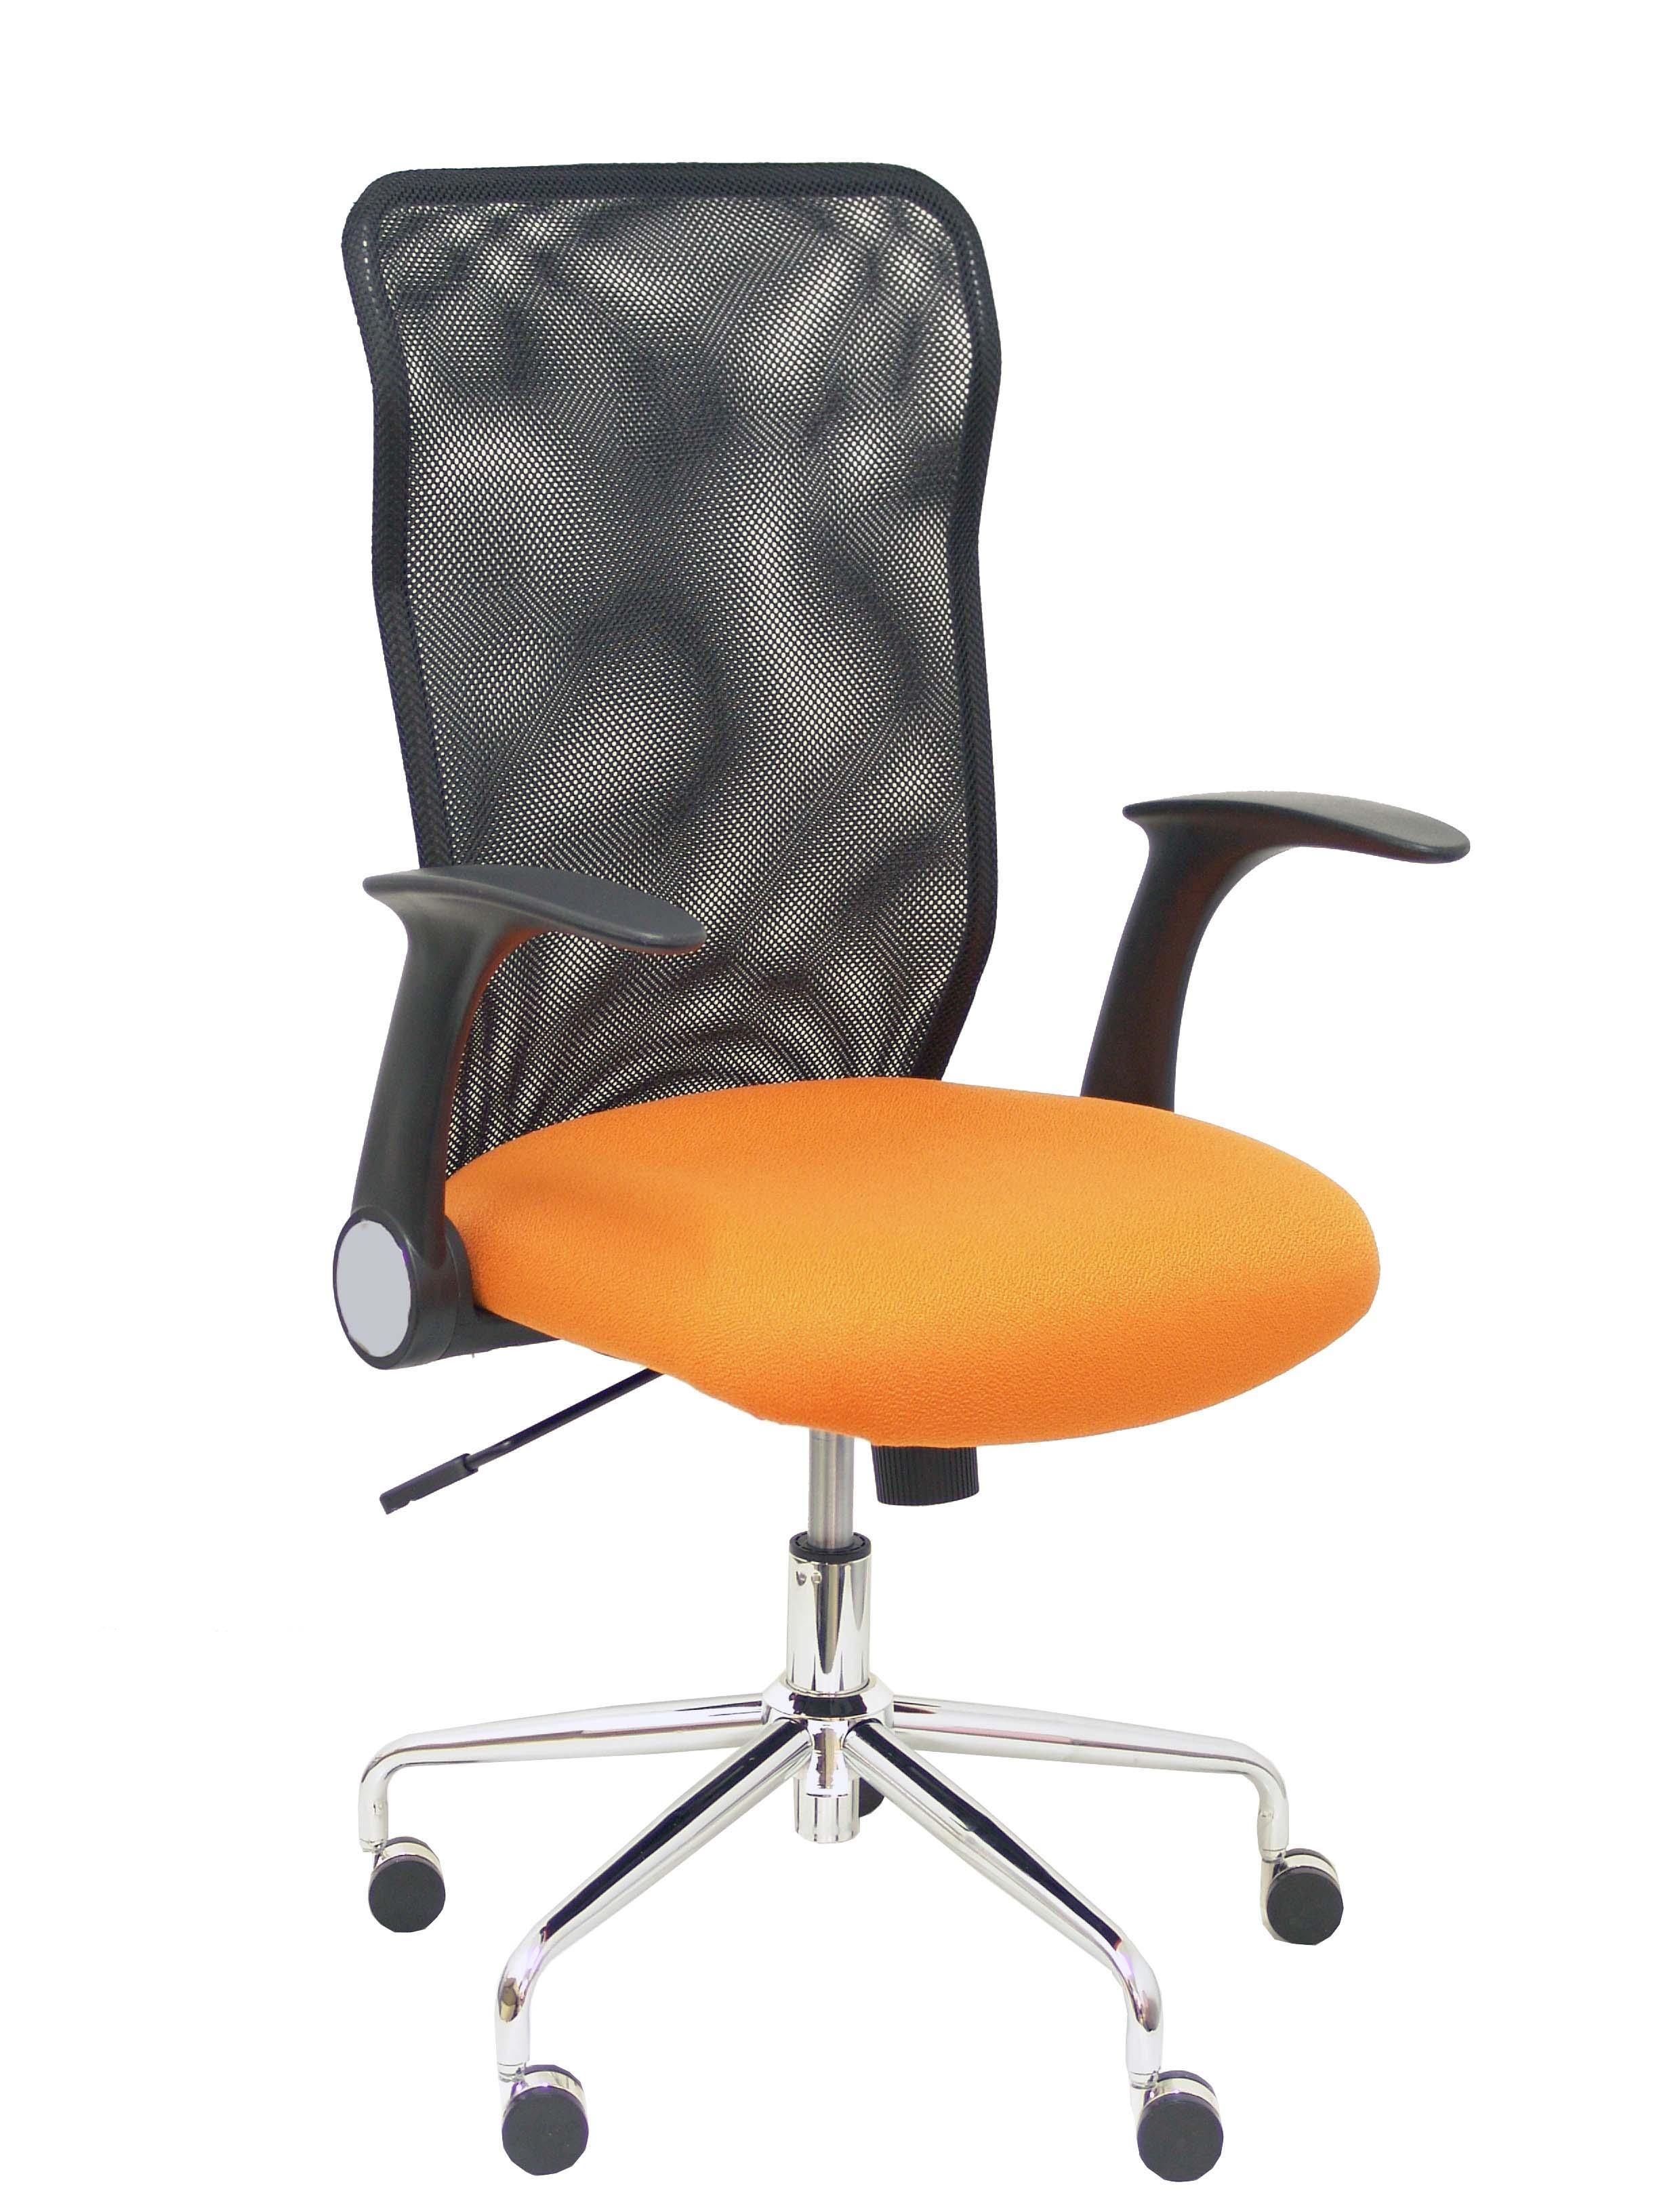 Silla Minaya respaldo malla negro asiento bali naranja